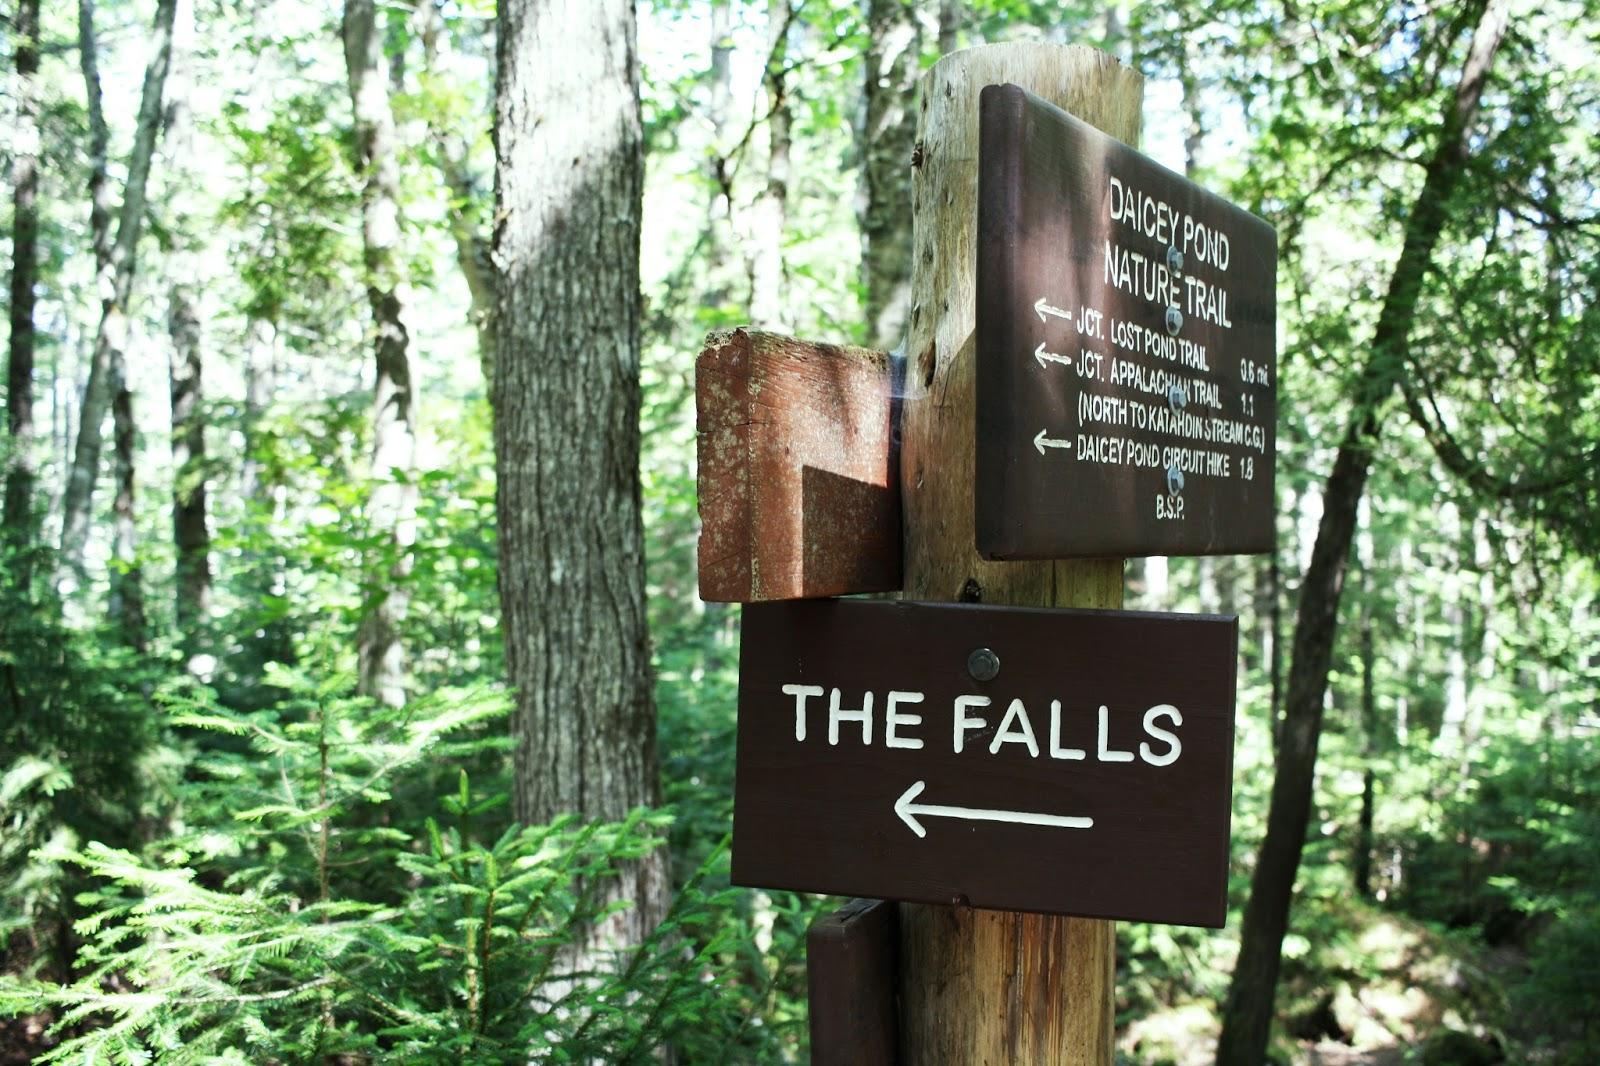 little Niagara and big niagra falls trail, baxter state park